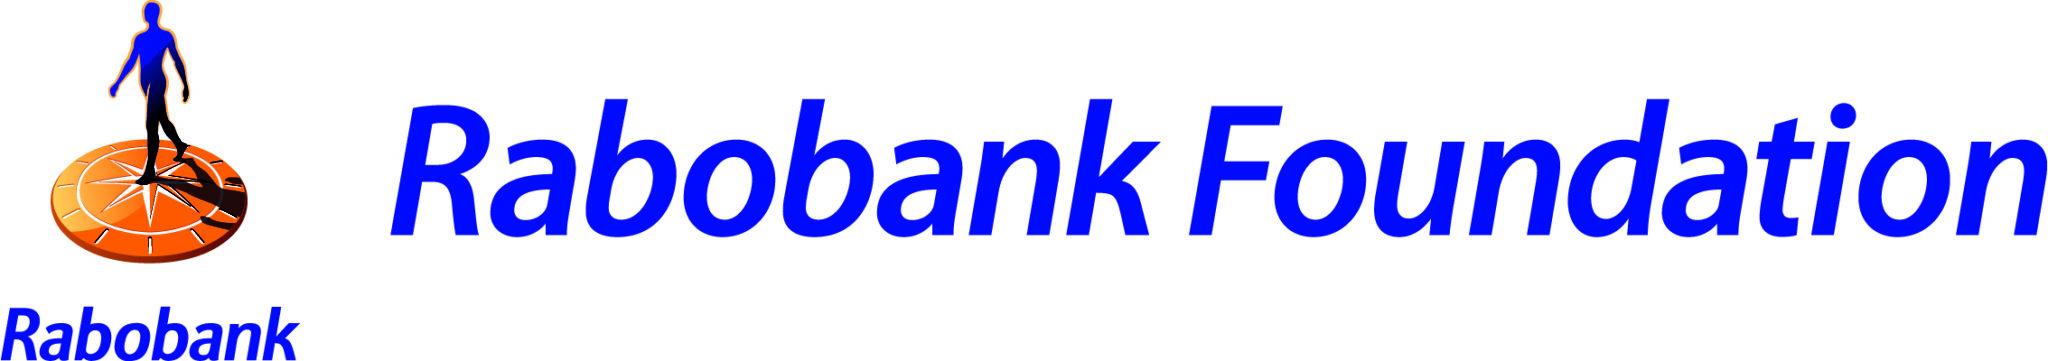 Rabobank Foundation